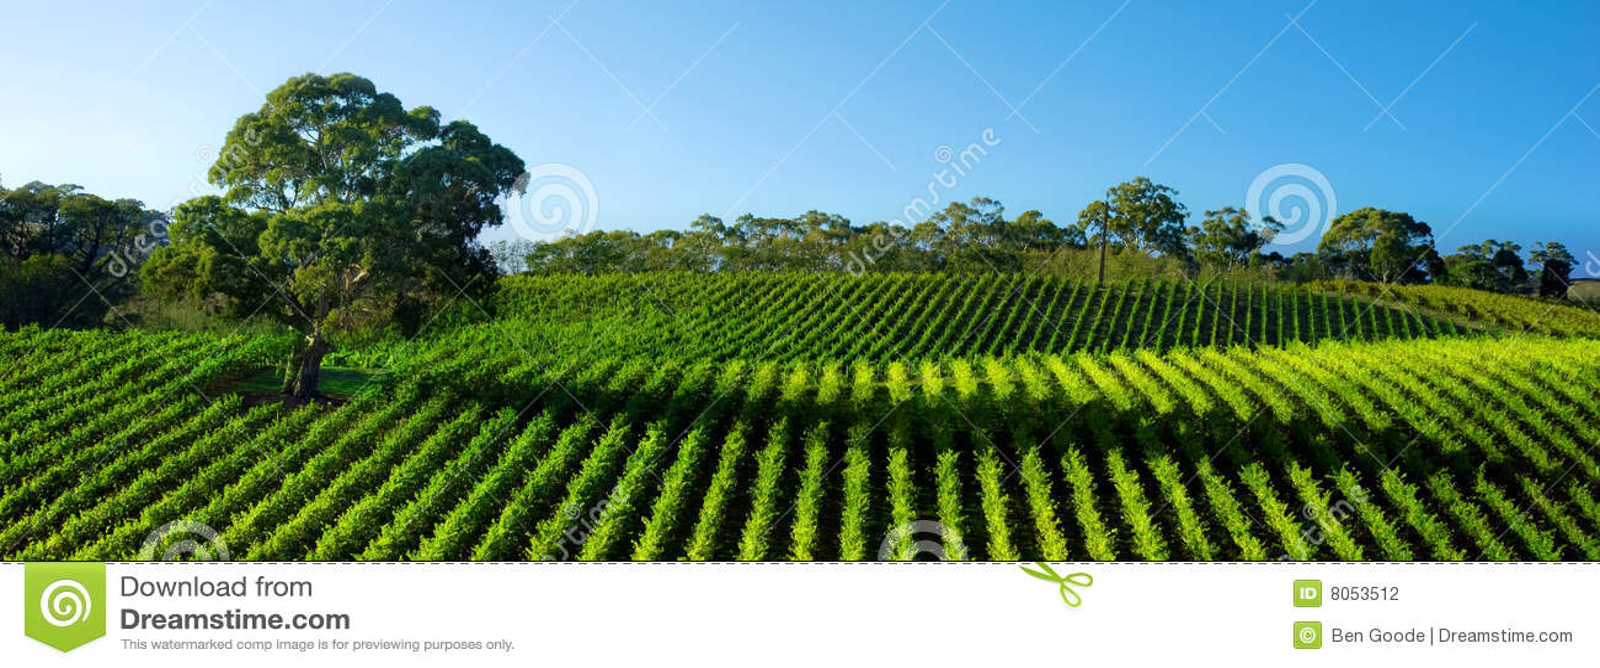 Panorama vívido do vinhedo